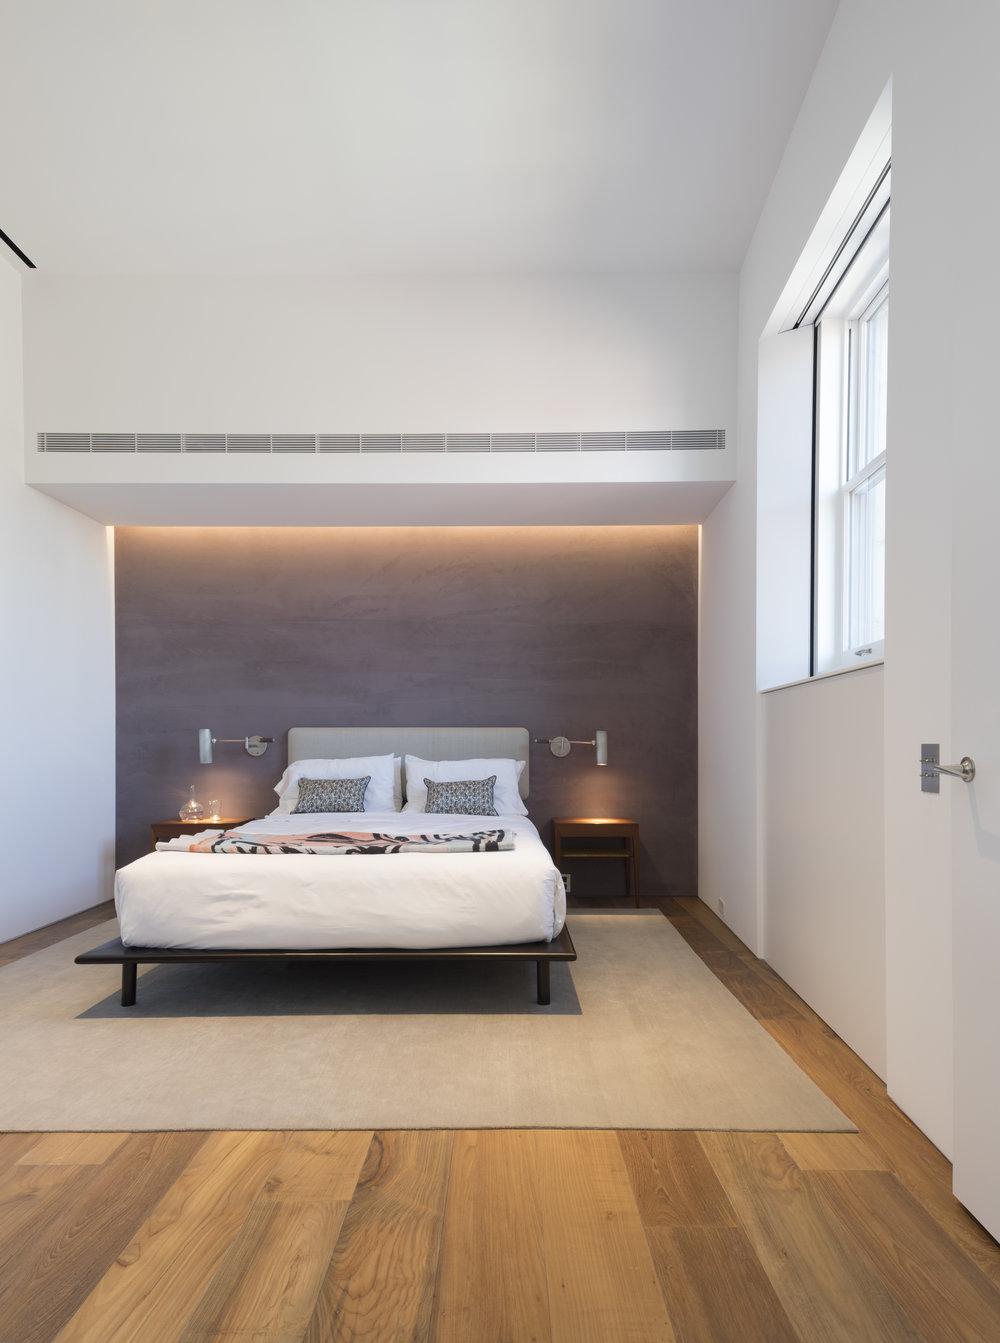 Police-Building-Apartment_Selldorf-Architects_Nicholas-Venezia_04.jpg